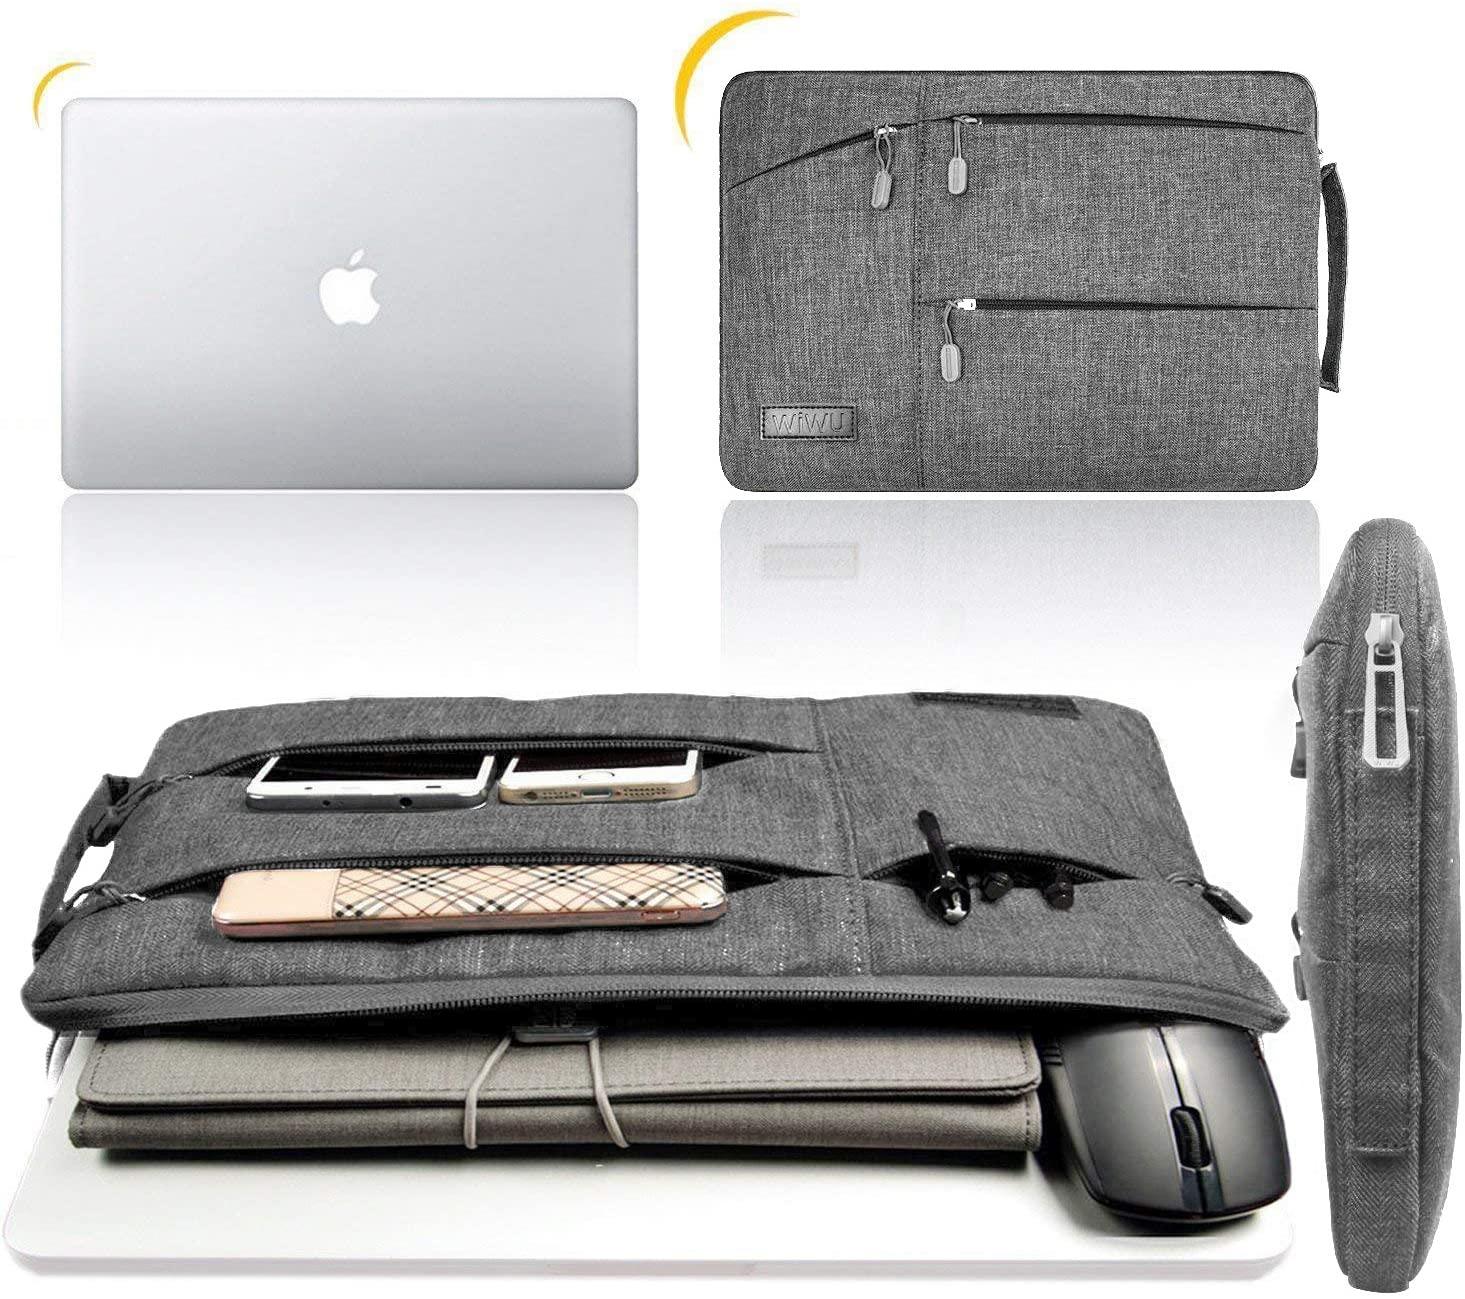 WIWU Laptop Sleeve for Apple Macbook